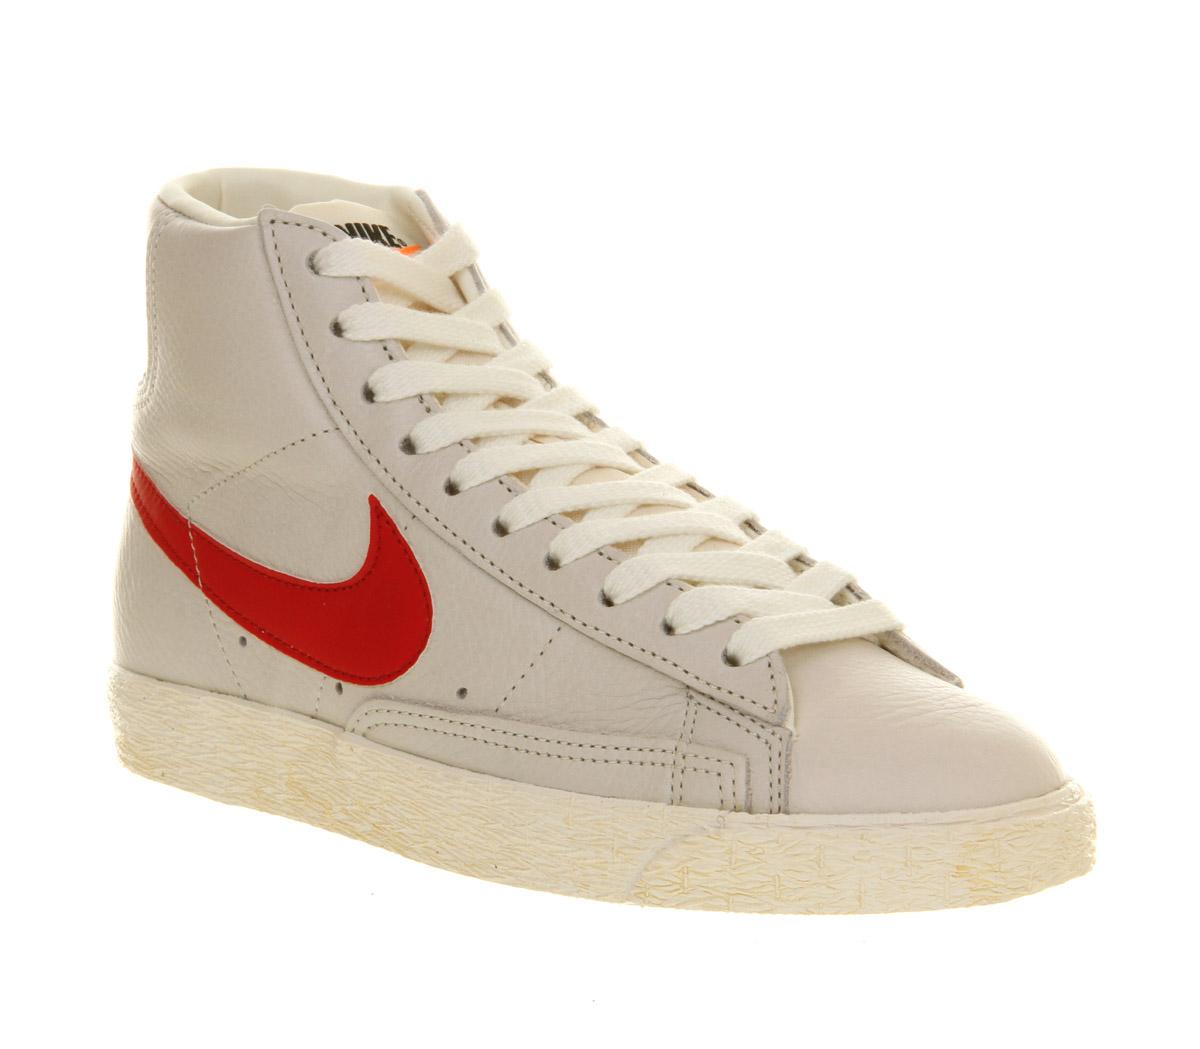 Vintage Mid Century Modern Desk Price Reduced: Nike Blazer Mid Vintage Leather Sail Red In White